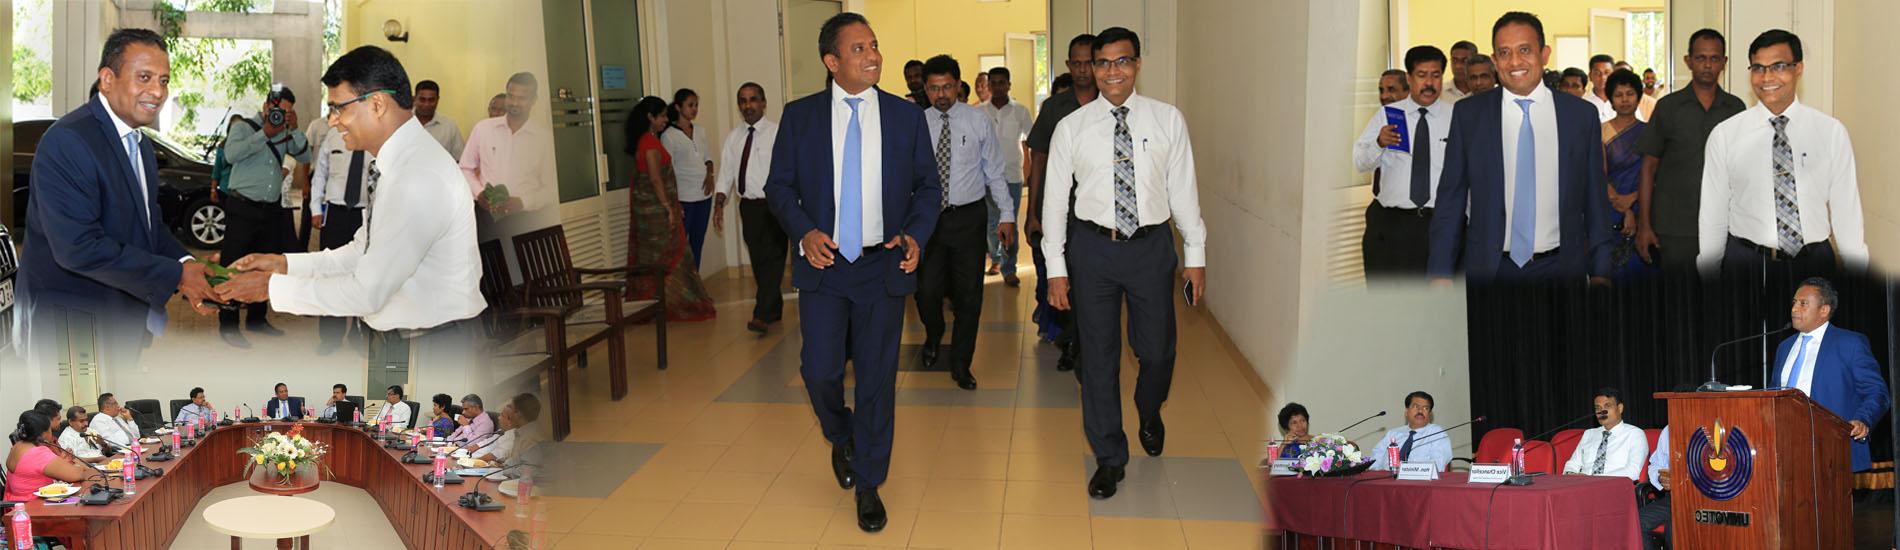 Minister's Visit of University of Vocational Technology